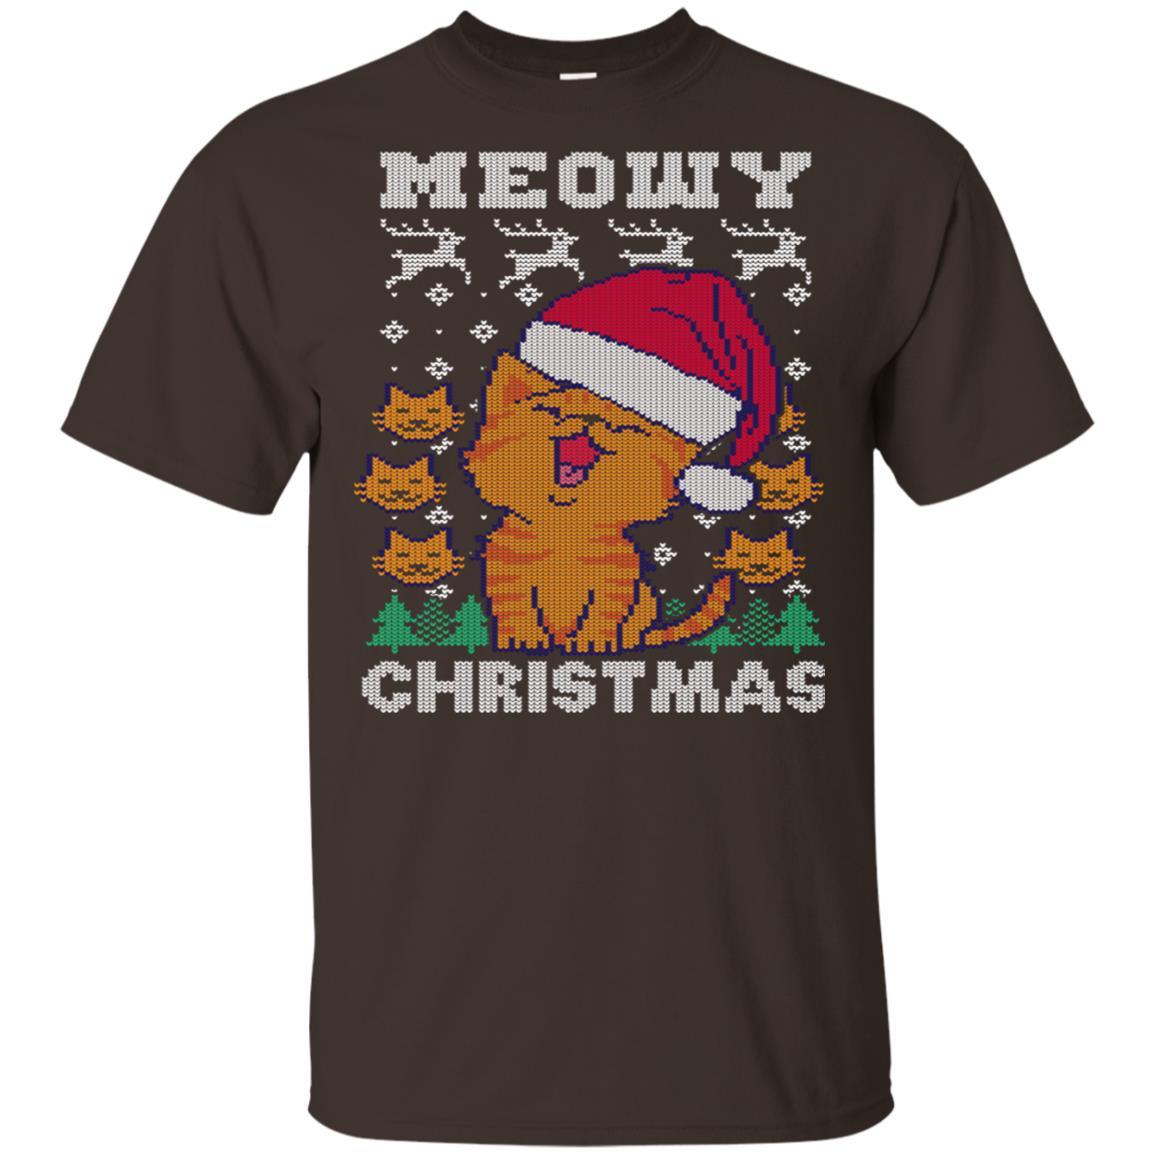 Meowy Merry Ugly Christmas Cat Lover Pun Gift Unisex Short Sleeve